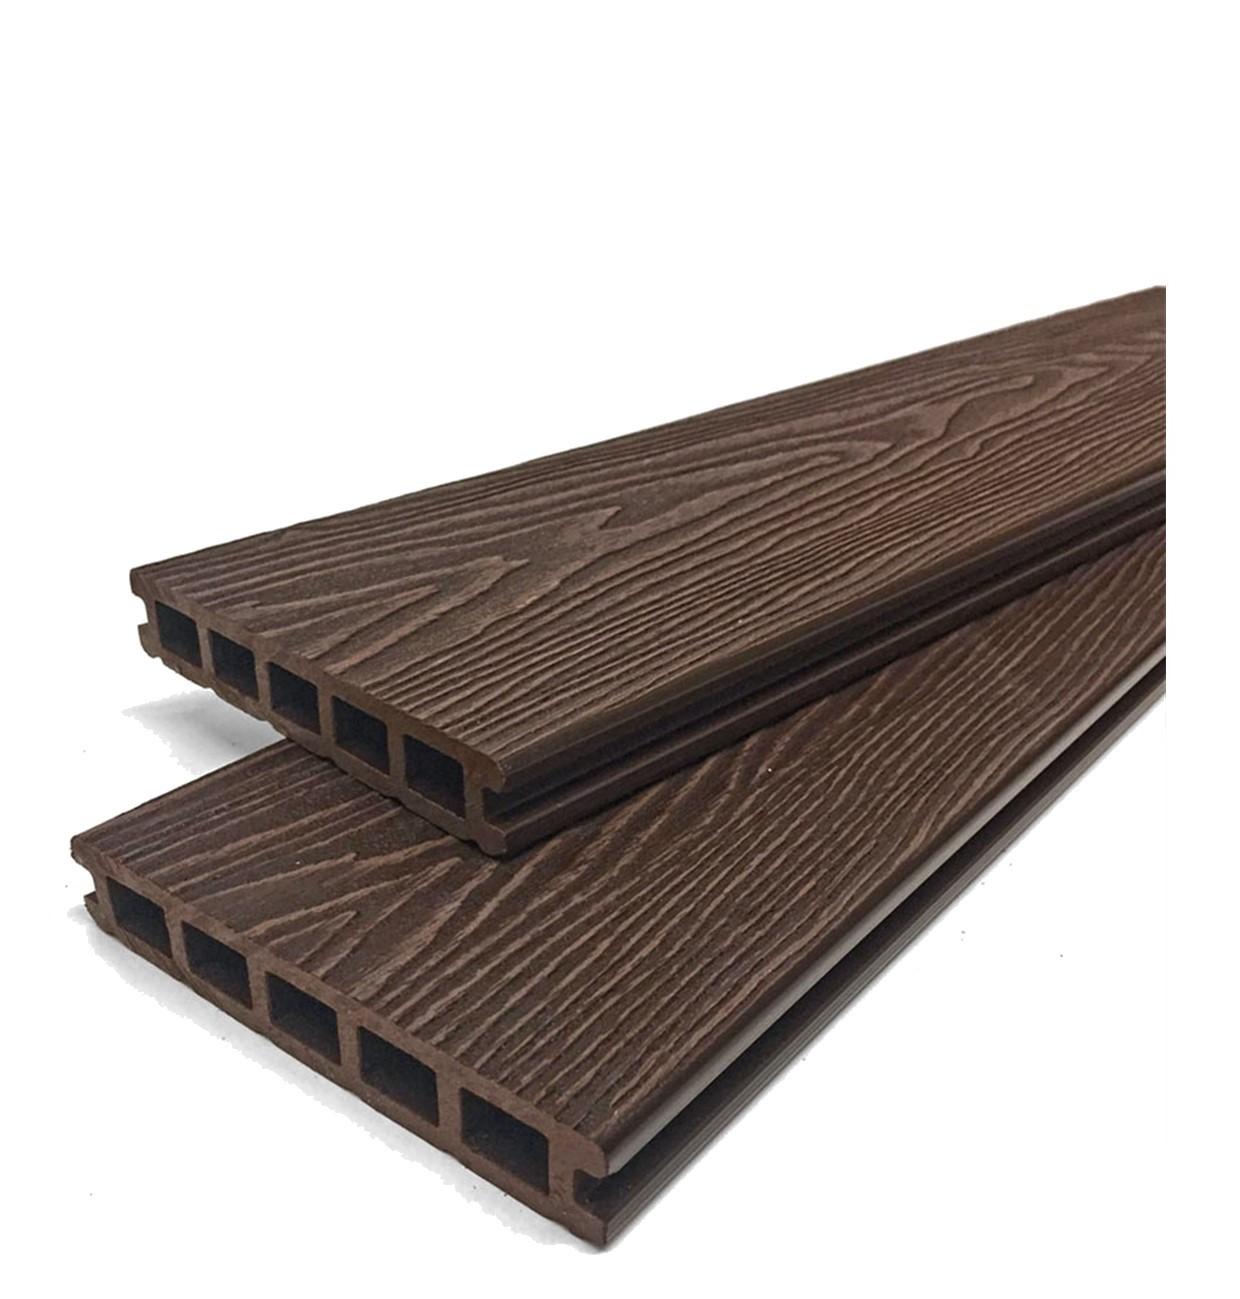 Mahogany Woodgrain Composite Decking Boards